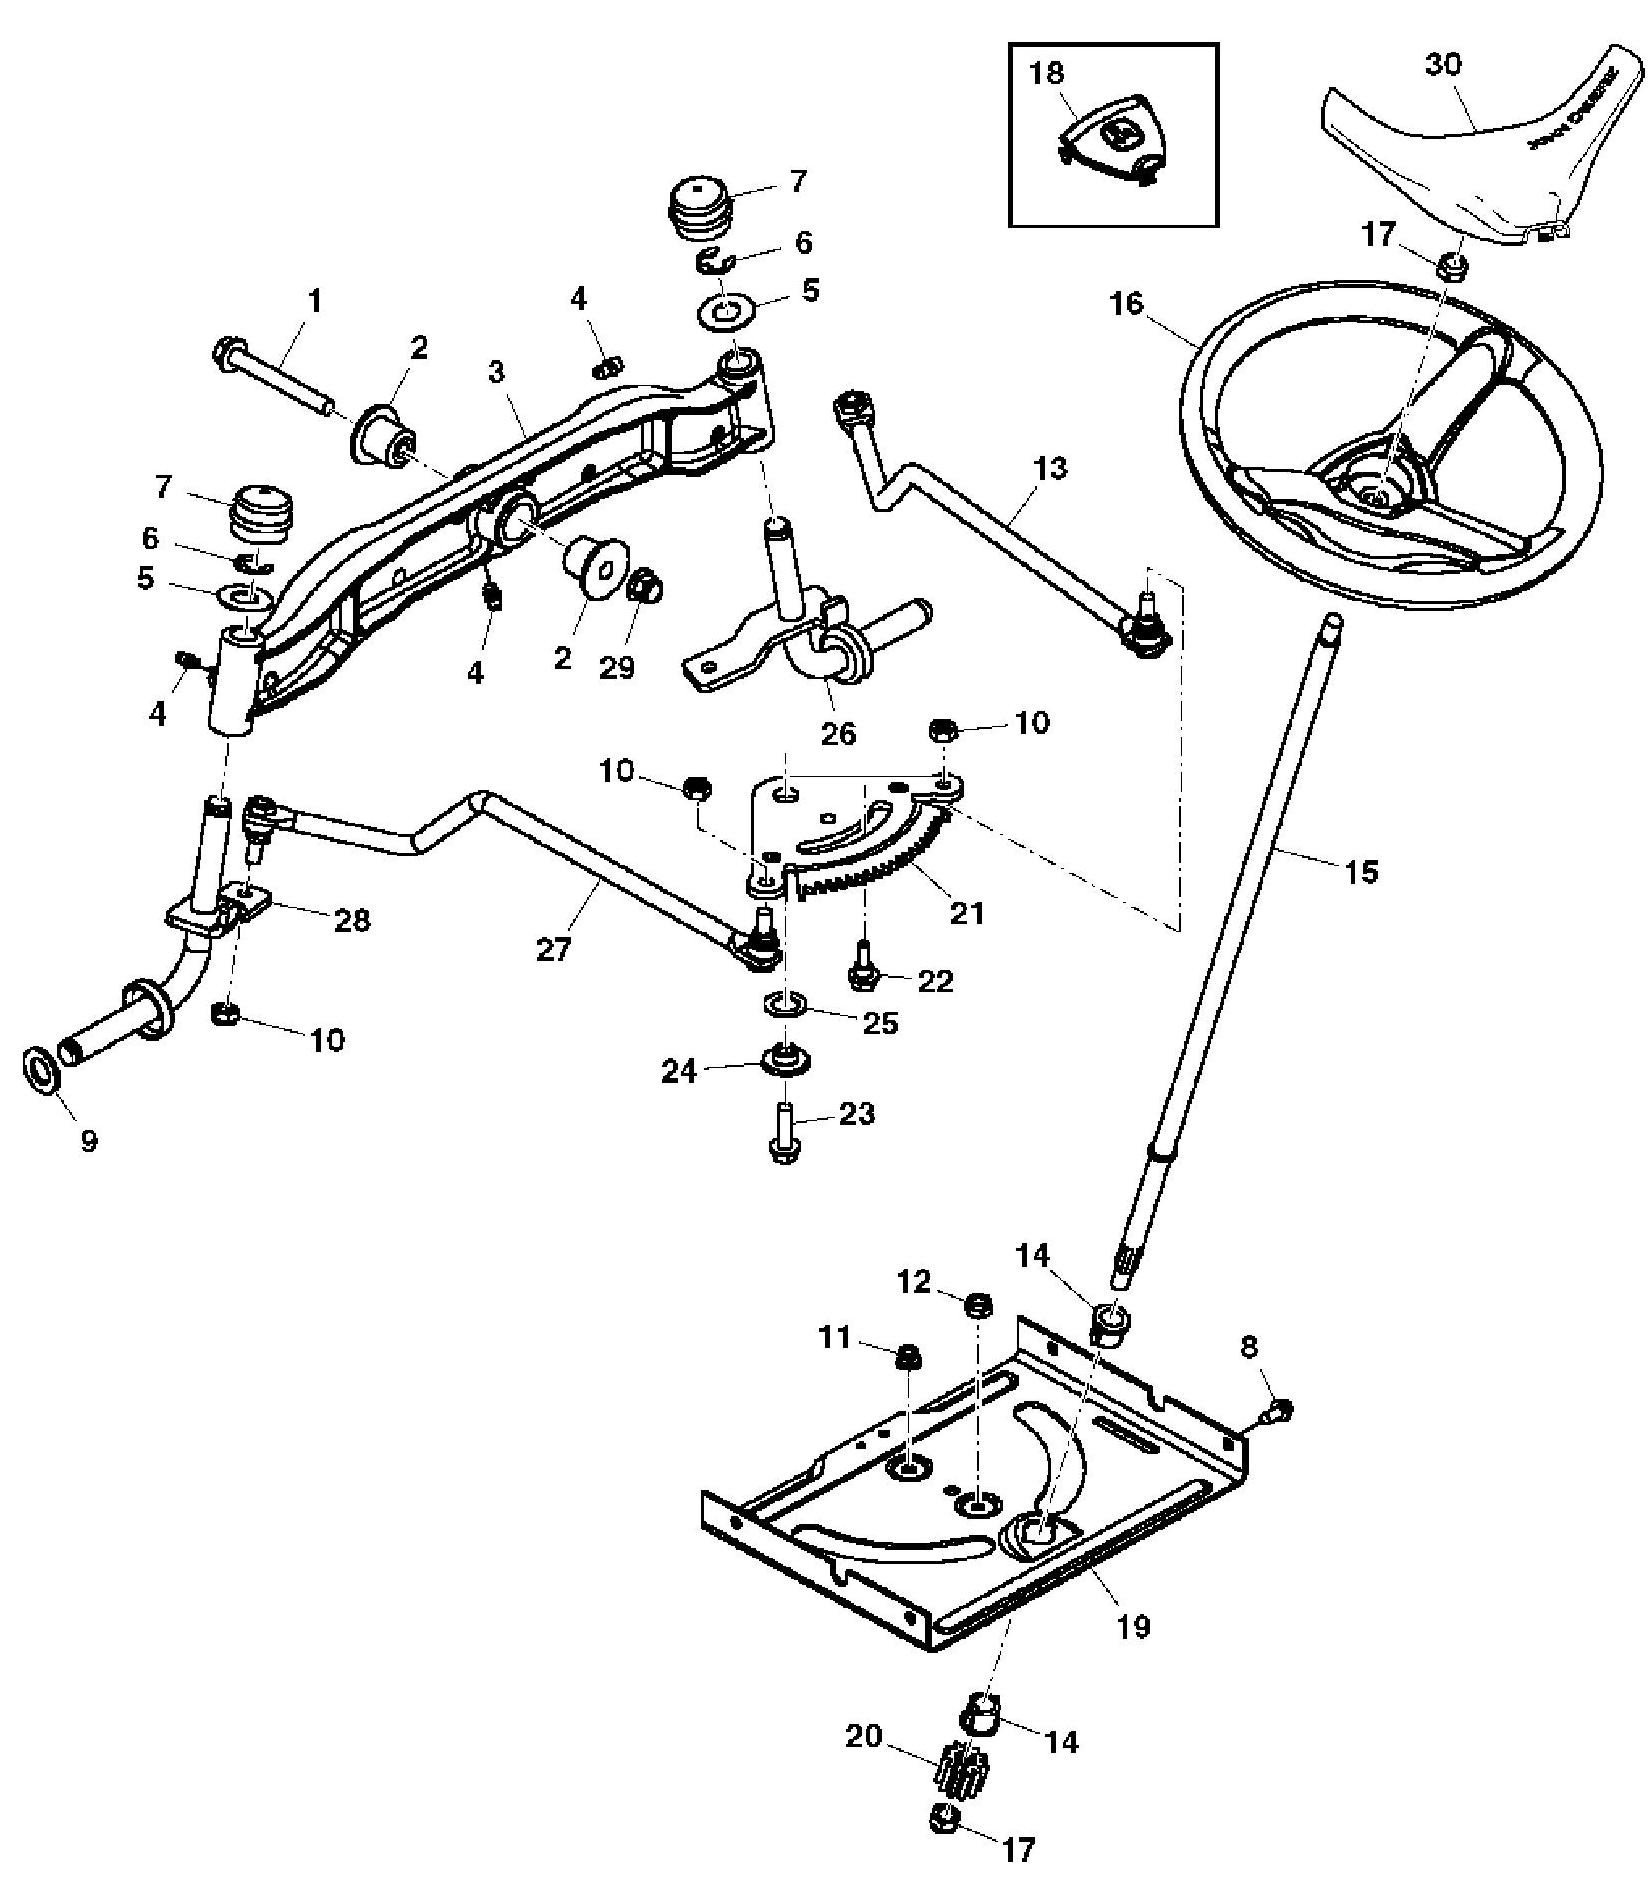 Tractor Engine Diagram John Deere L130 Engine Diagram John Deere X140 Garden Tractor Spare Of Tractor Engine Diagram